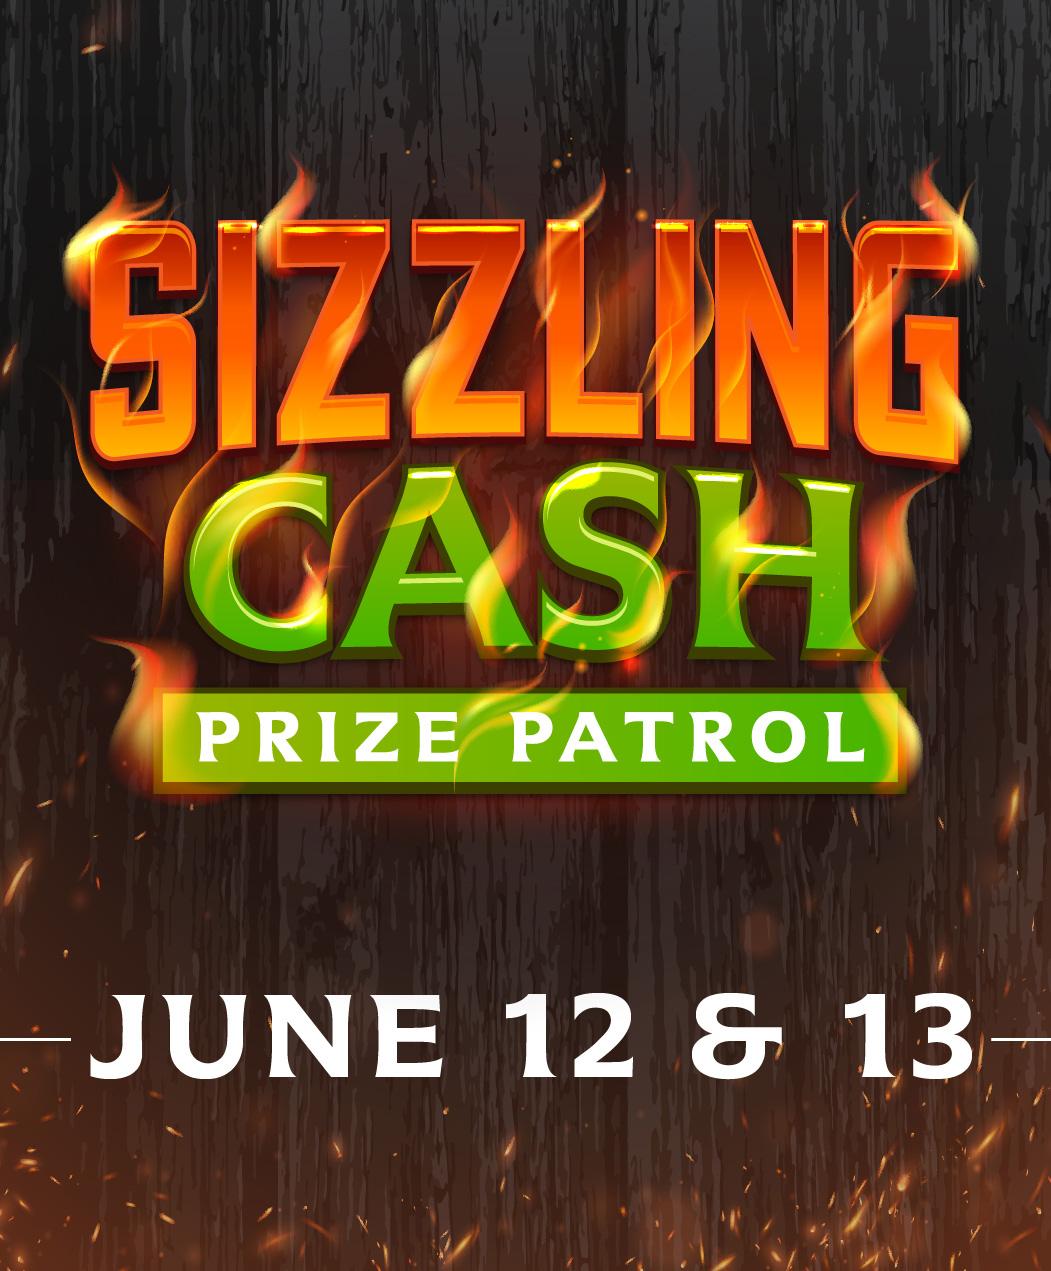 Sizzling Cash Prize Patrol